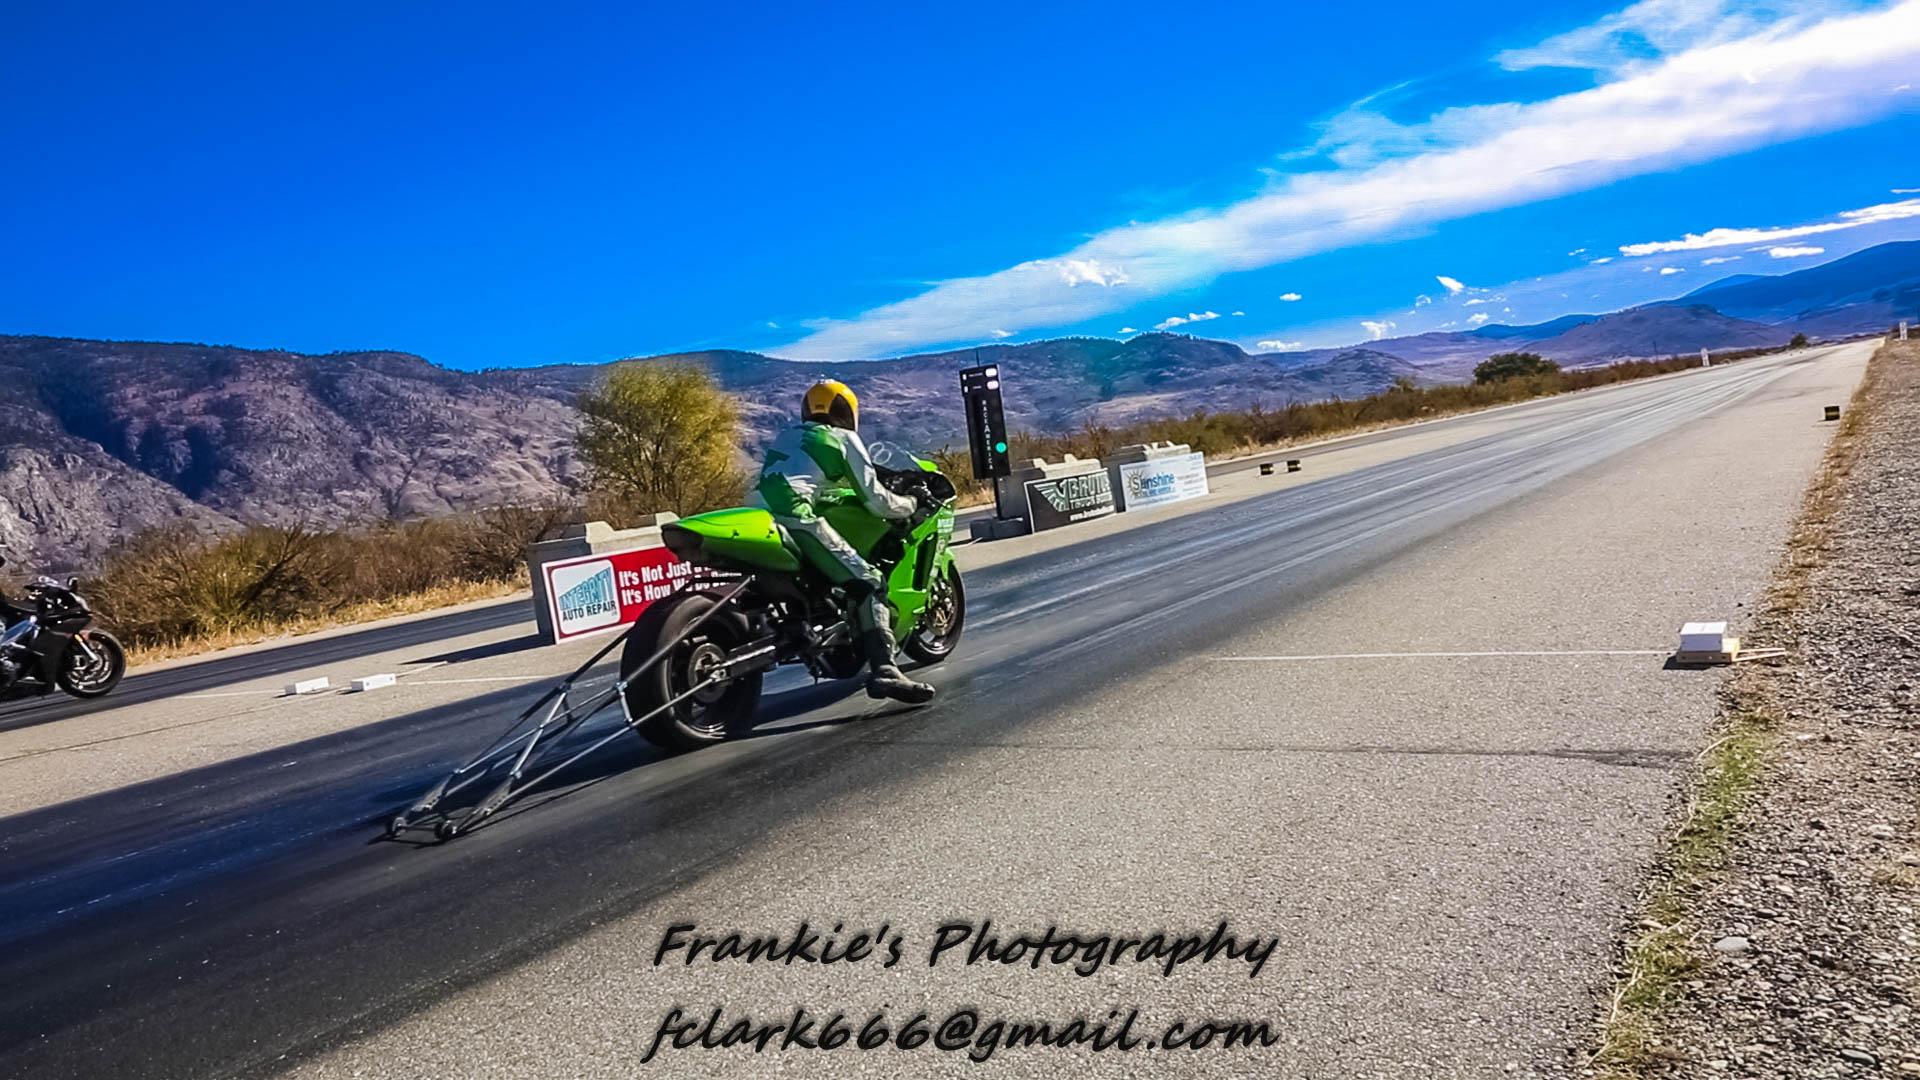 final-race-day-2016-rpm-osoyoos-6518-1-13cbfb070749bd95af549e9e6293f5bda84c4c33